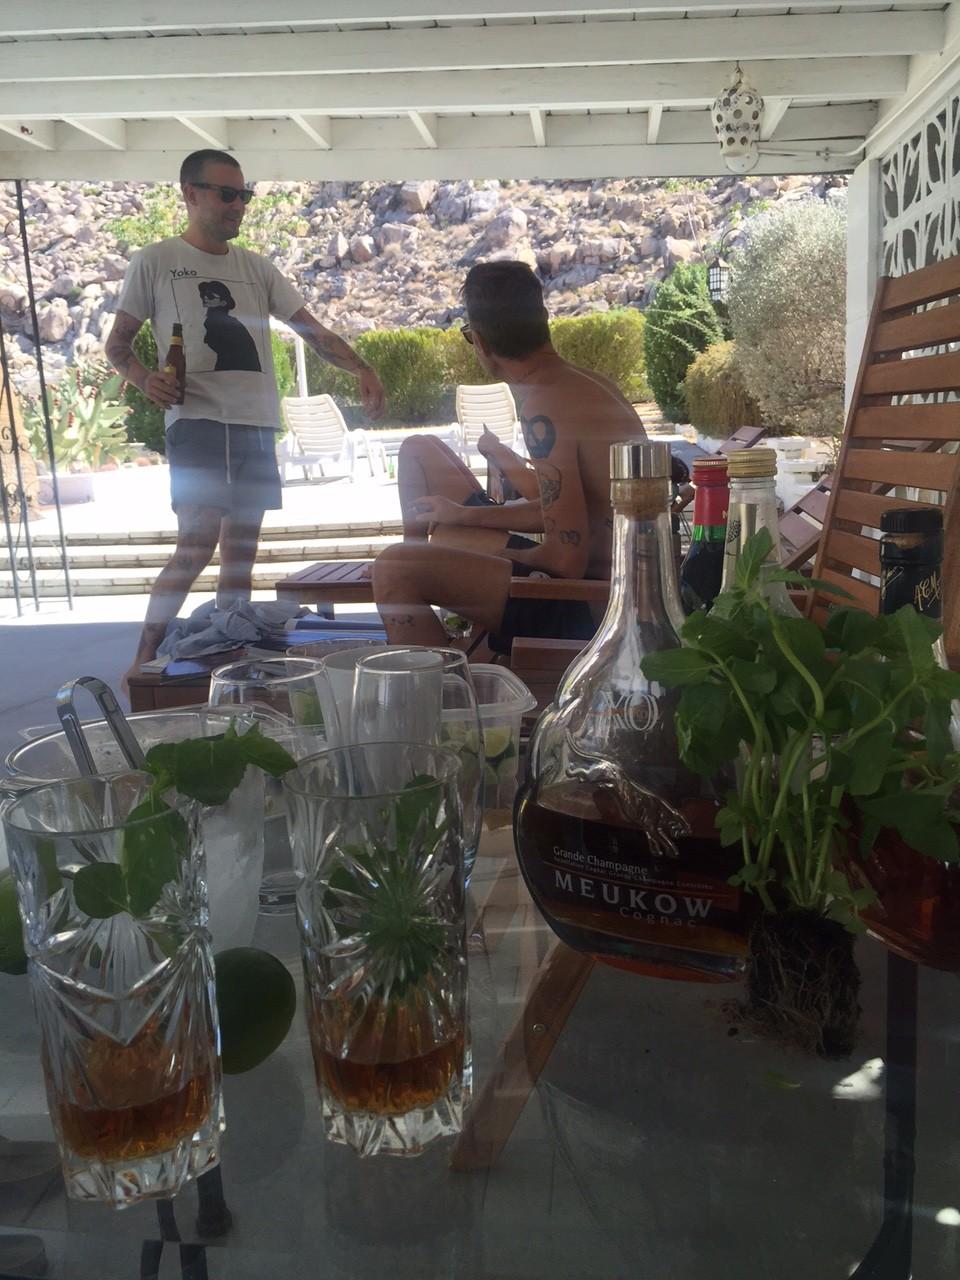 Sophie's Meukow Cognac Cocktails - from California!